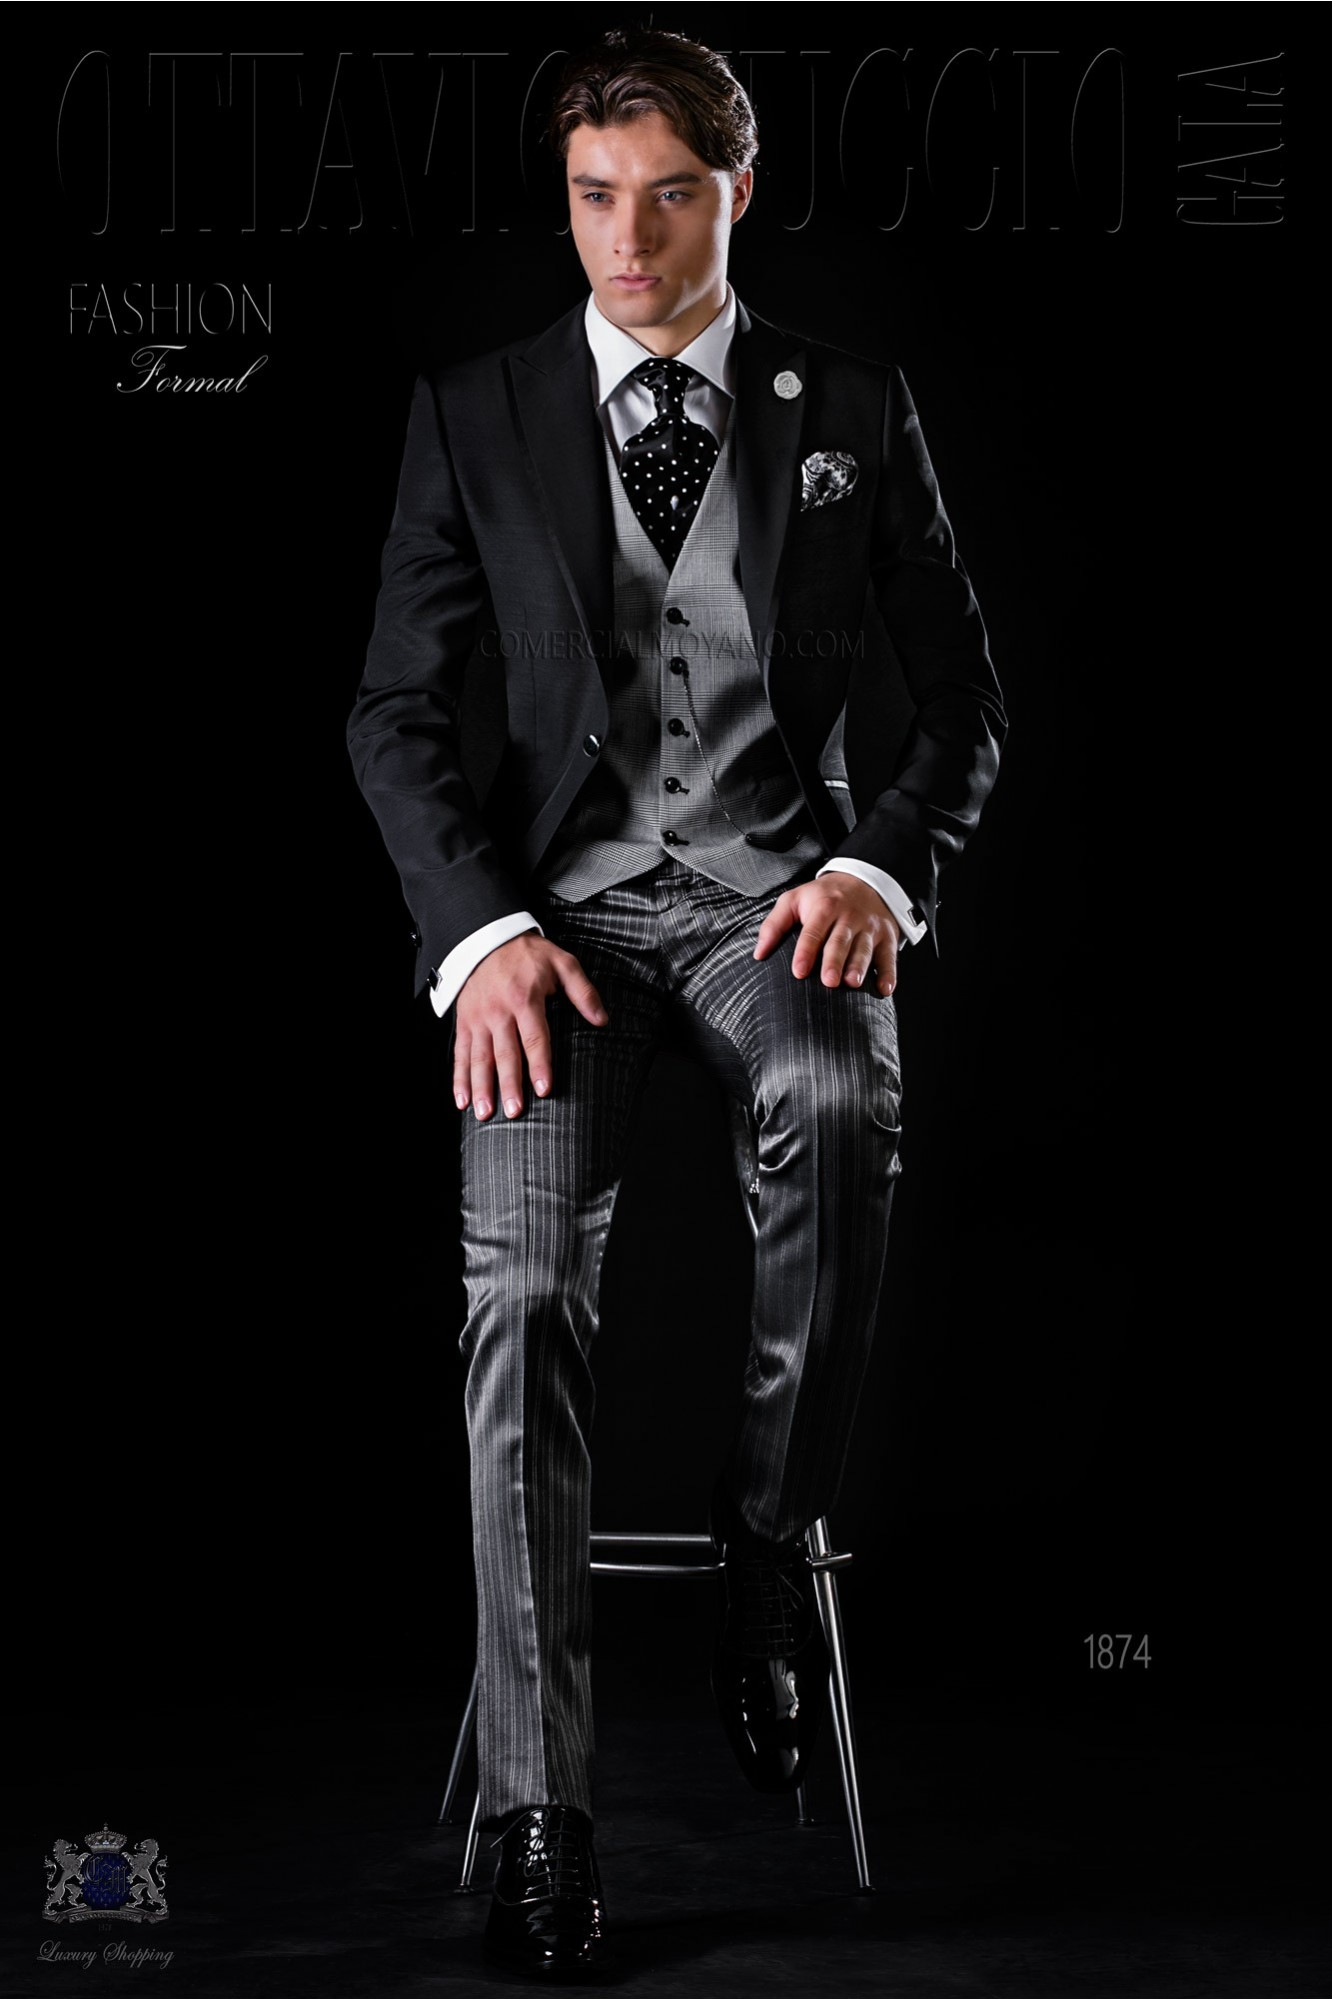 Traje de novio chaqueta negra con pantalón media etiqueta modelo: 1874 Ottavio Nuccio Gala colección Fashion 2017